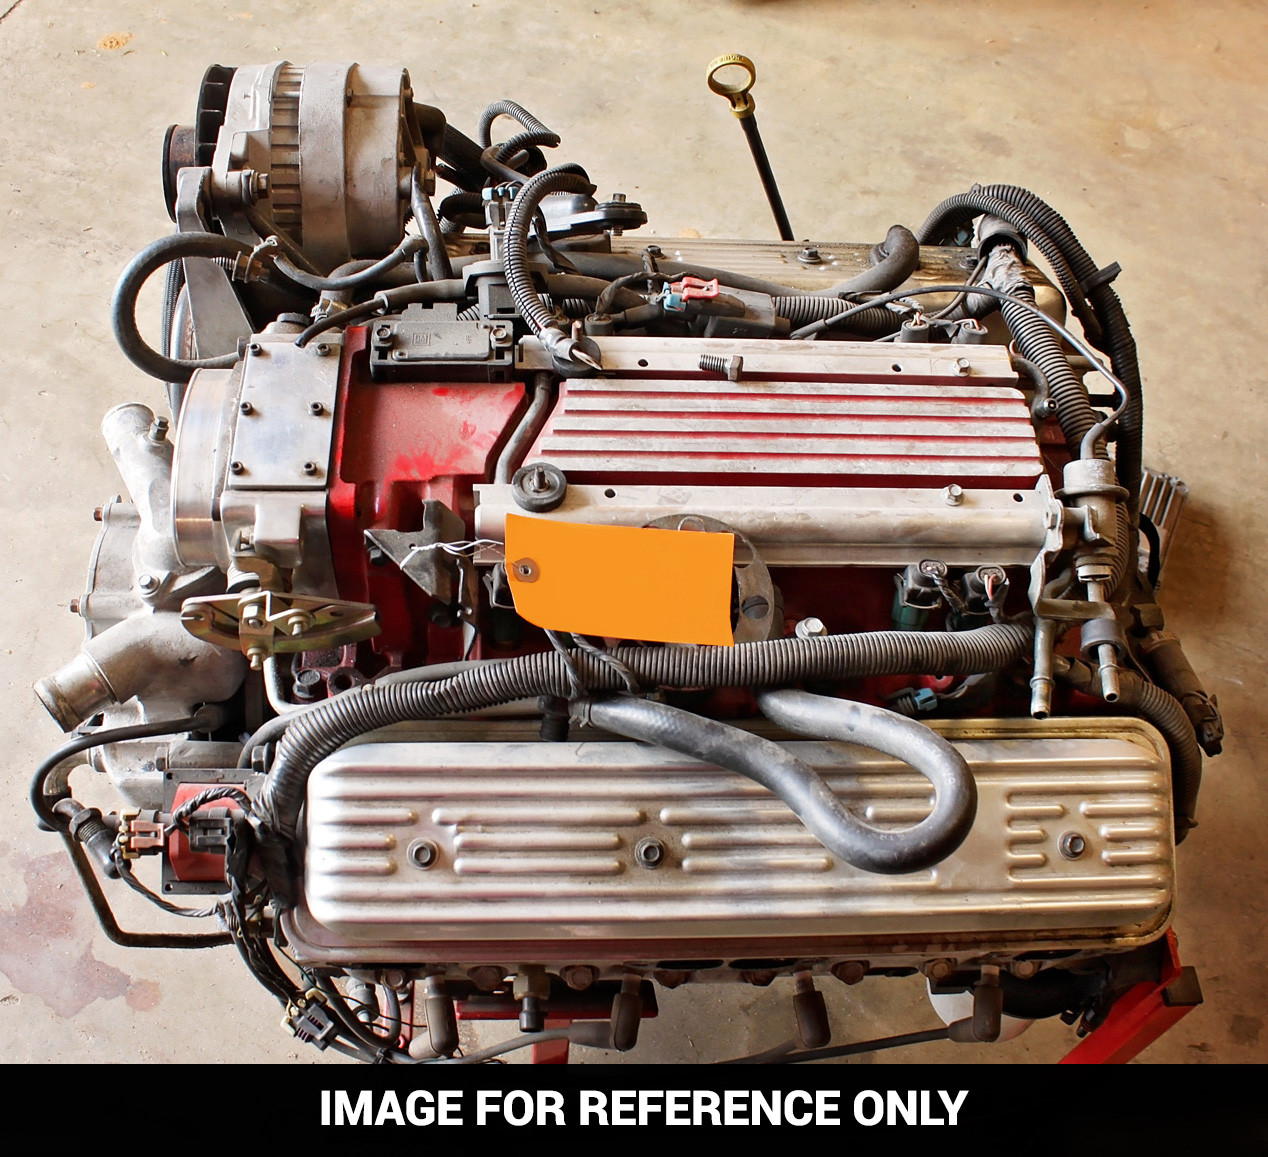 1997 Pontiac Firebird Lt1 Engine Diagram Trusted Wiring Diagram \u2022  Trans AM WS6 Wheels 1996 Firebird Engine Diagram